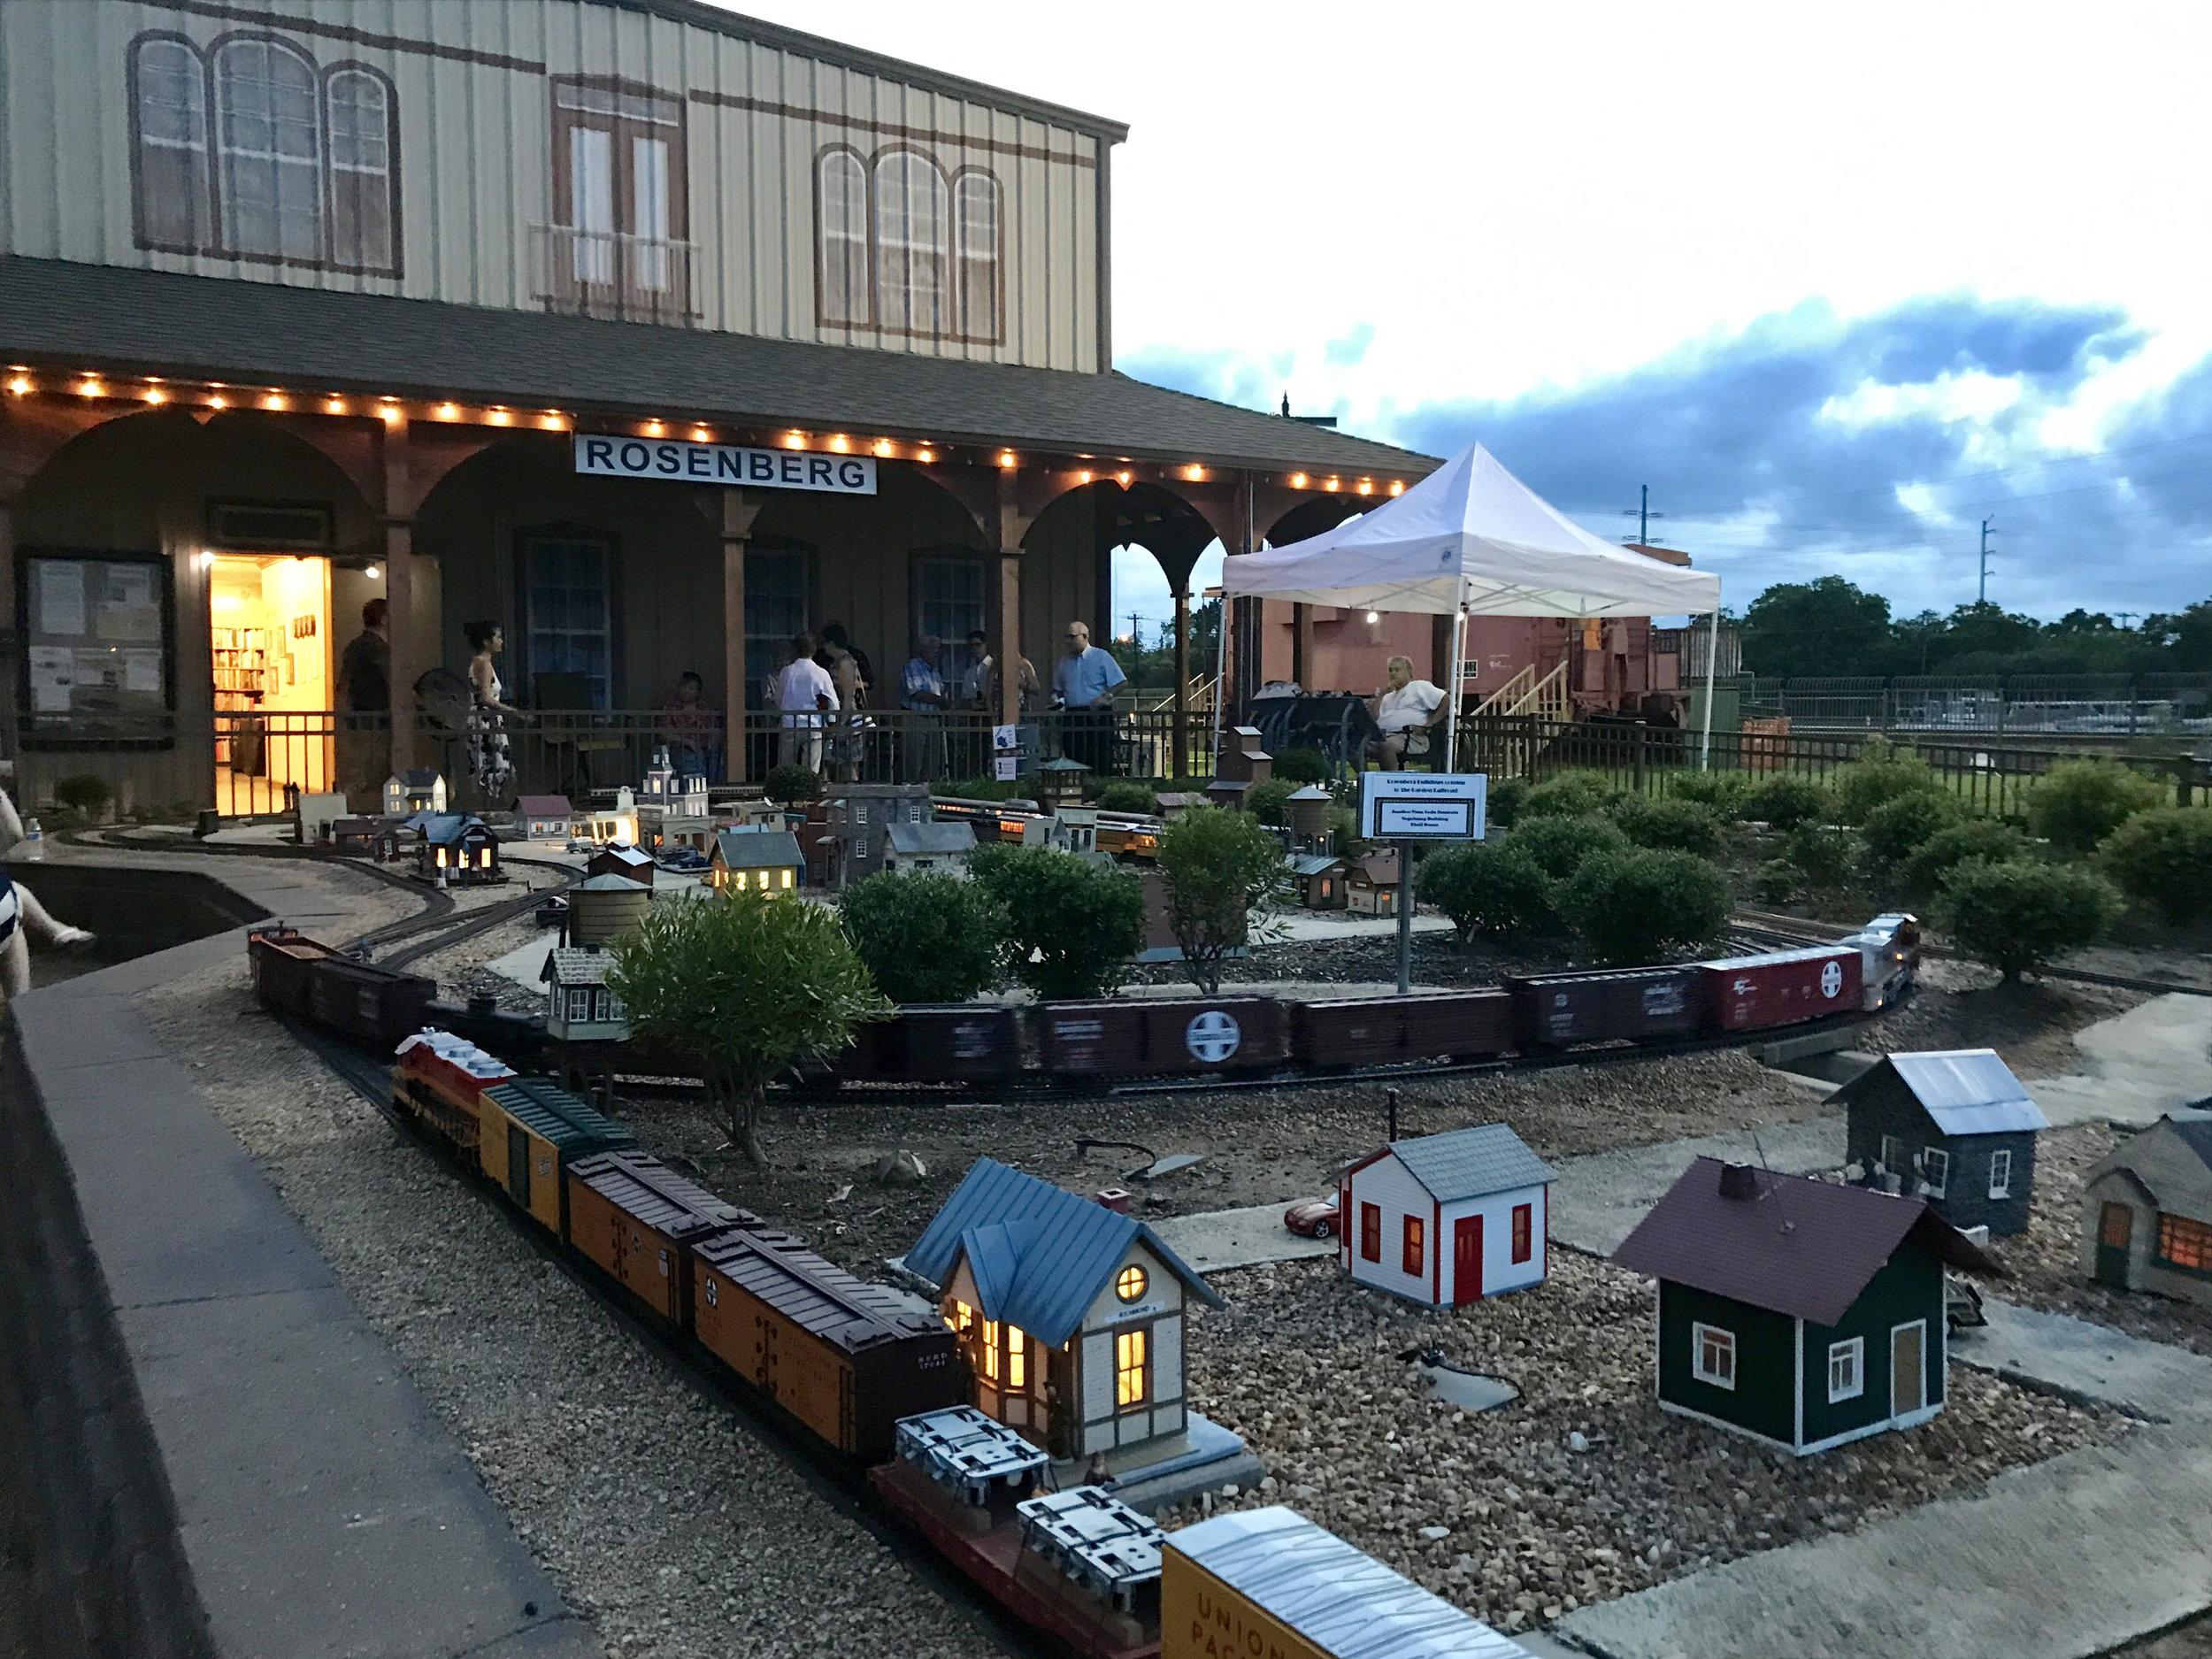 Garden Railroad lit up at night